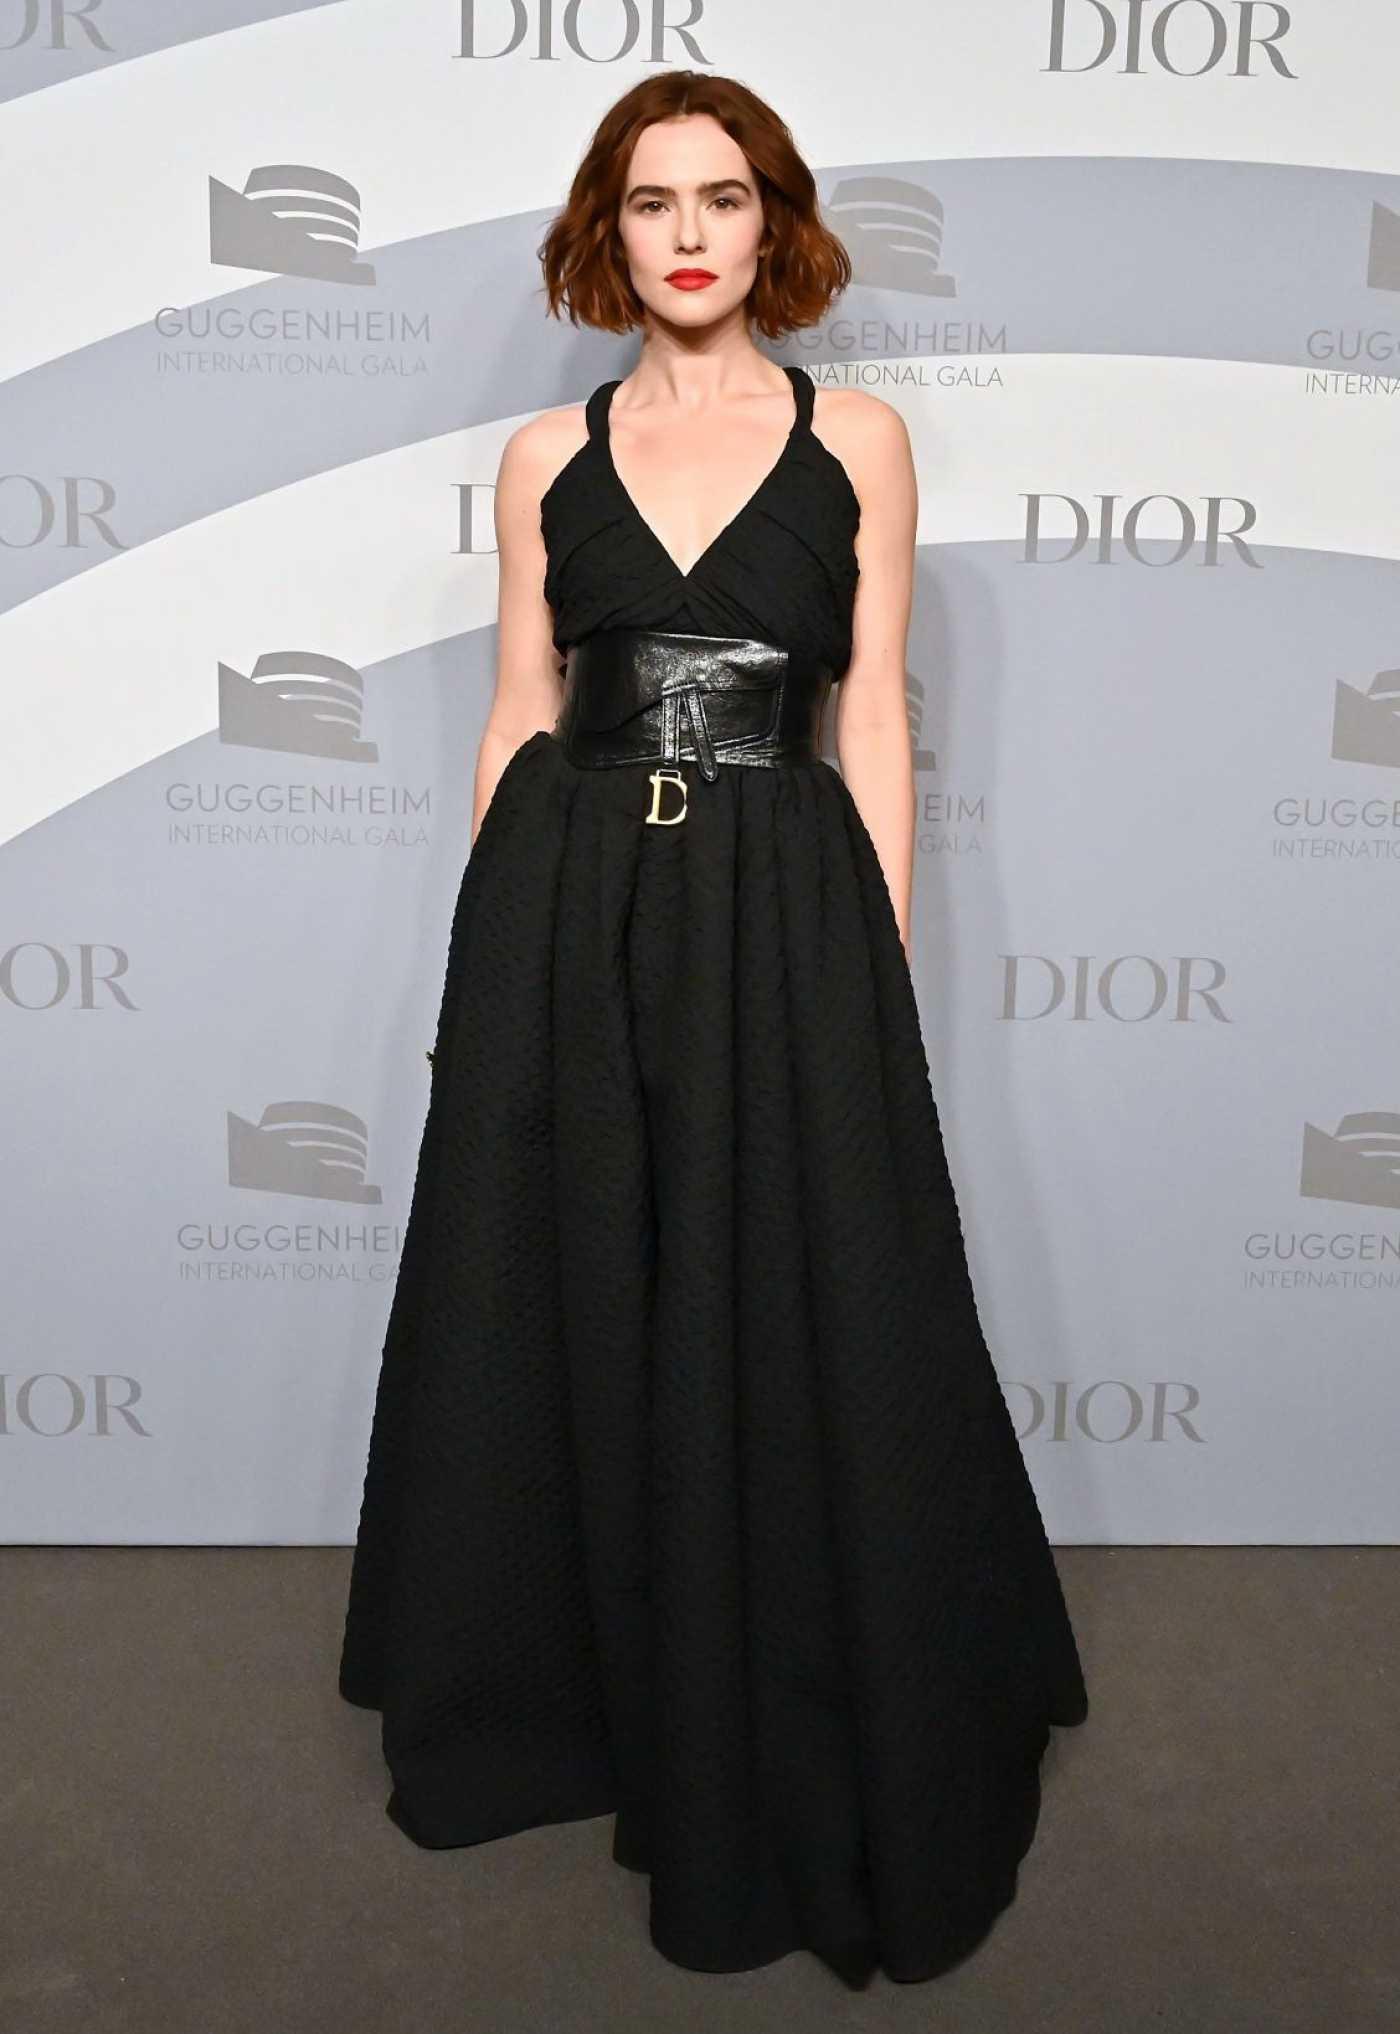 Zoey Deutch Attends 2019 Guggenheim International Gala in New York 11/13/2019